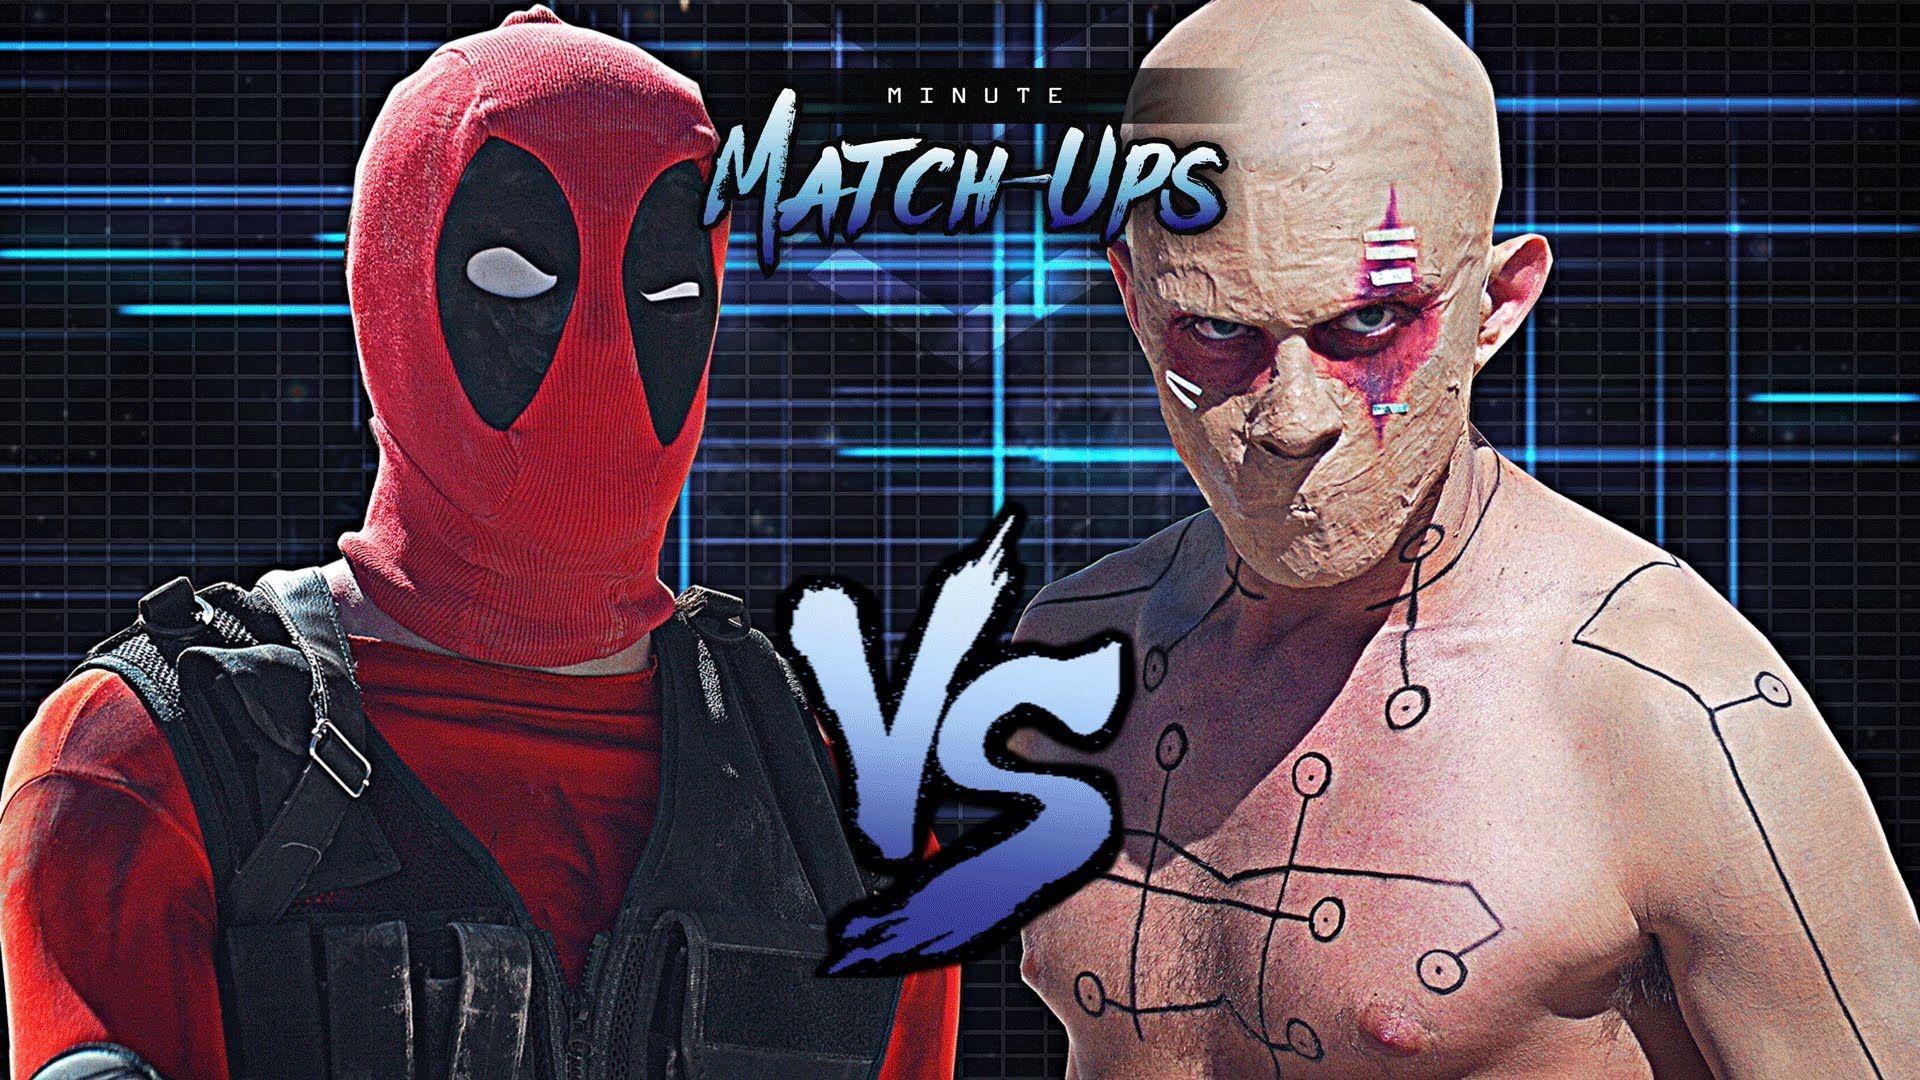 Deadpool V Deadpool Dawn Of Deadpool Minute Match Ups Episode 1 Deadpool Comic Deadpool X Men